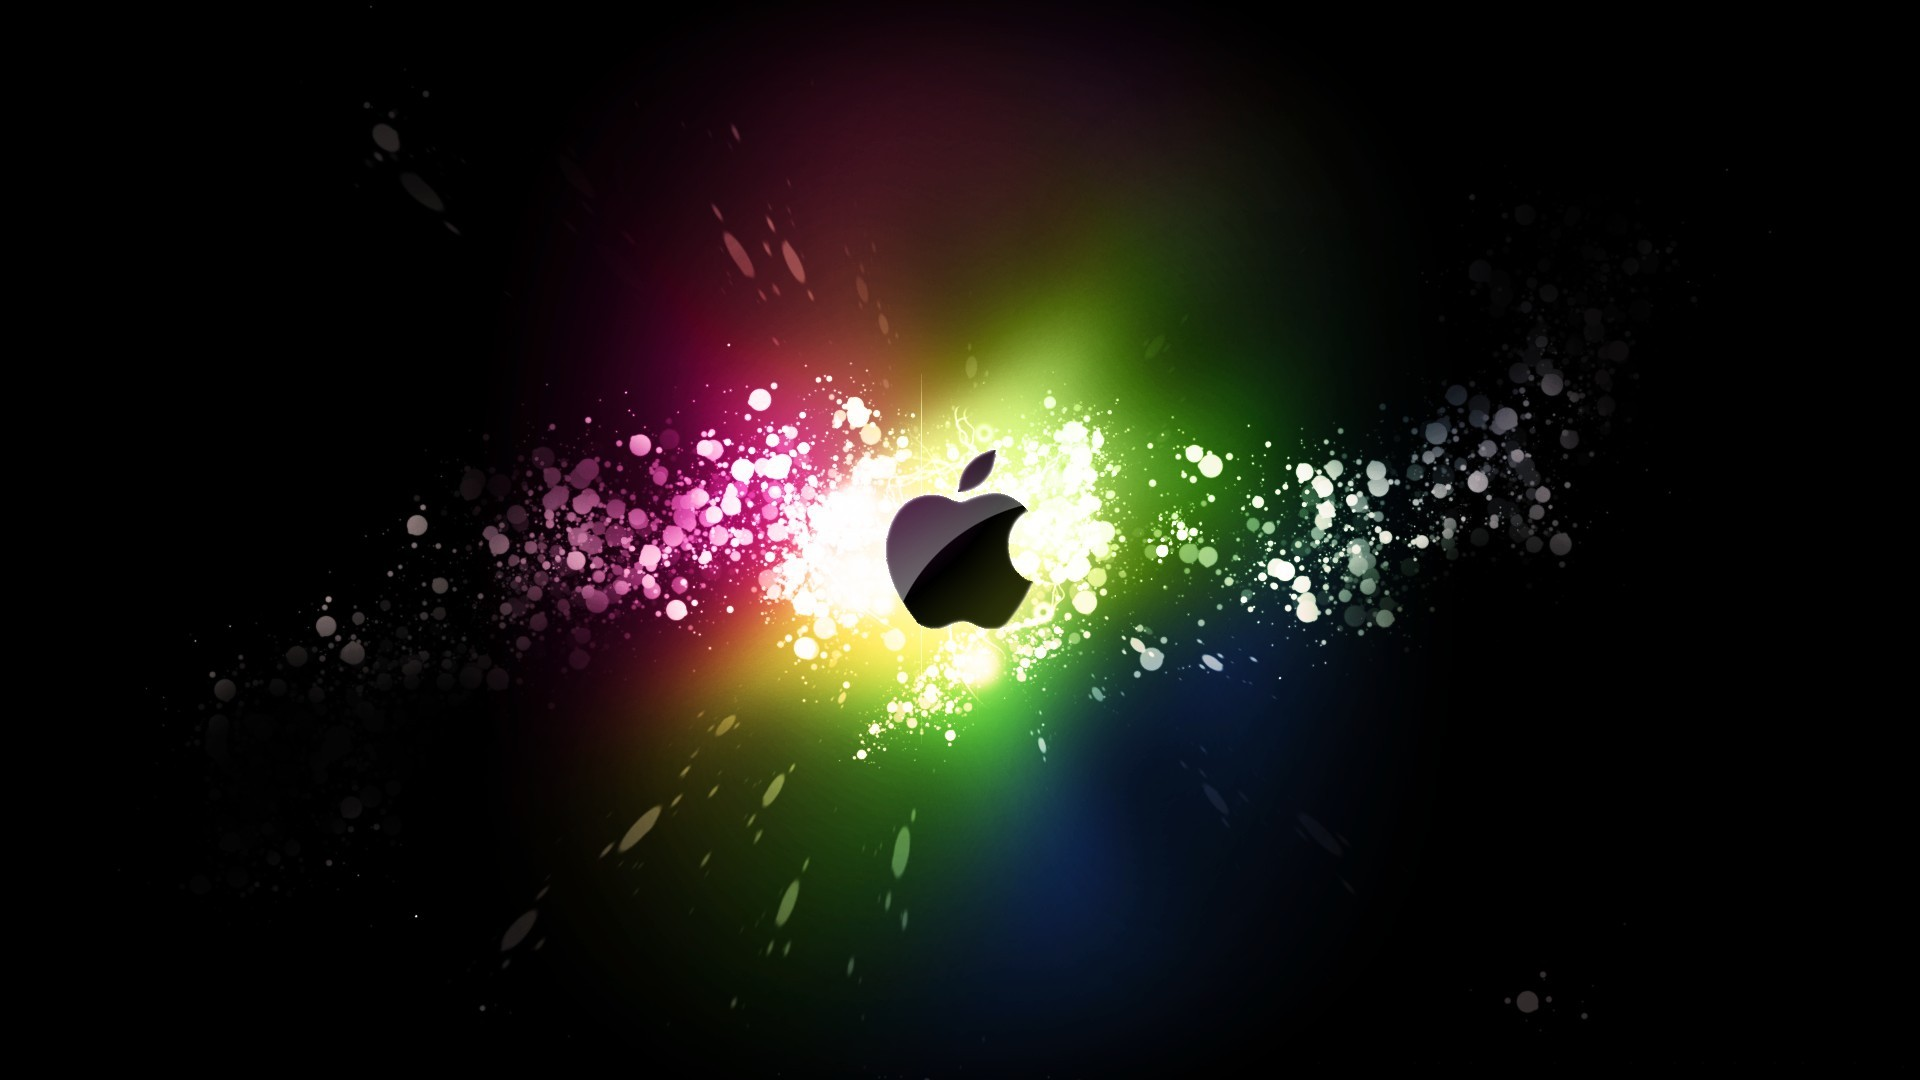 Apple 3d Background Widescreen 1 Download Desktop Wallpapers HD 1920x1080